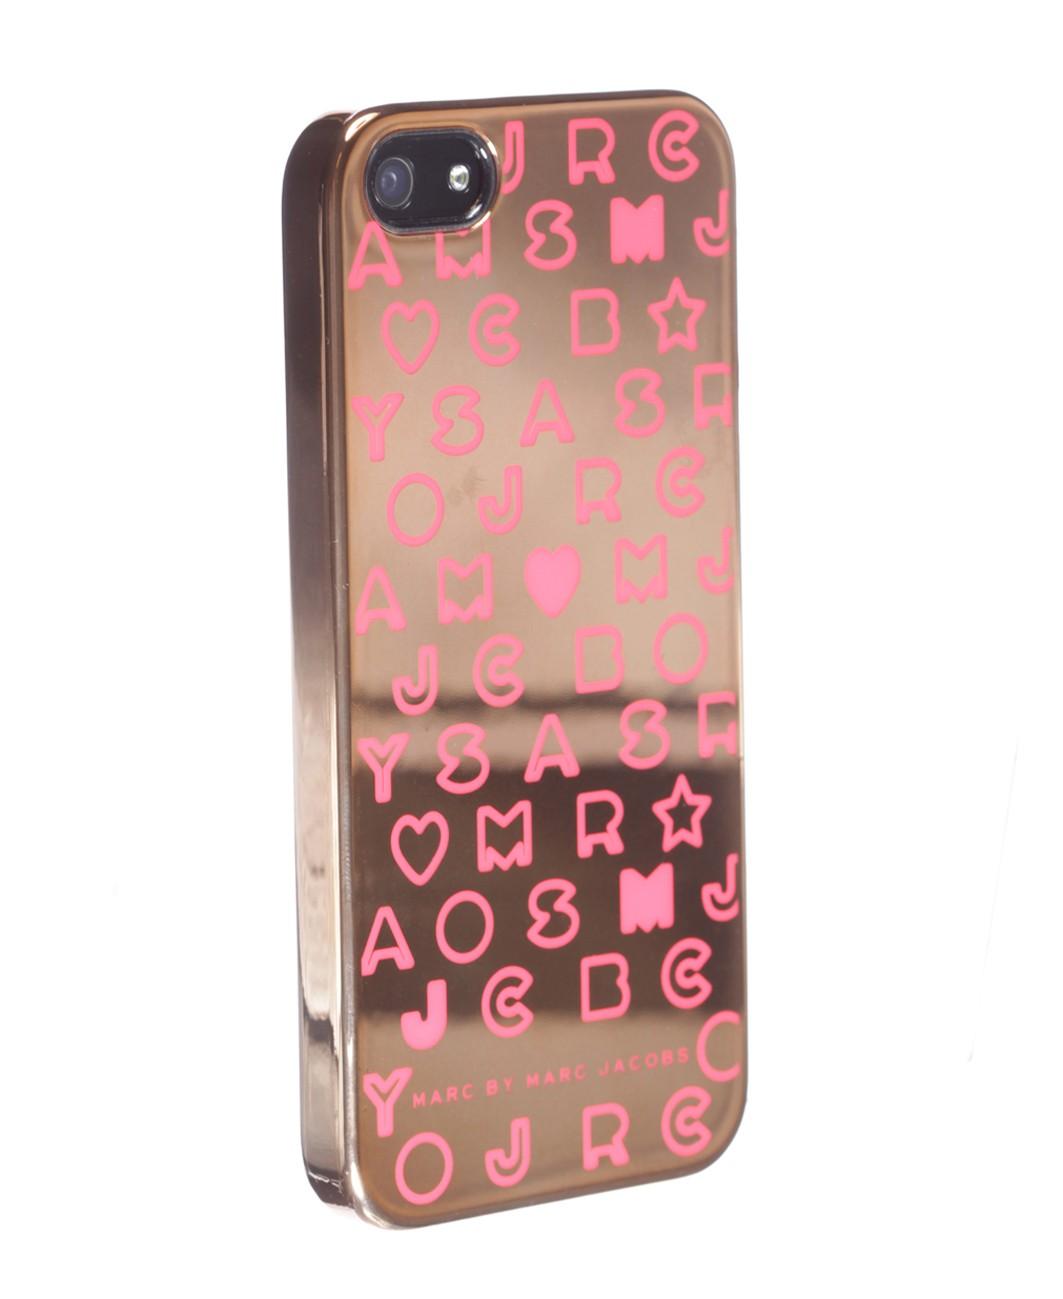 Marc Jacobs - Stardust Metallic iPhone 5 Case - Rose Gold Colour